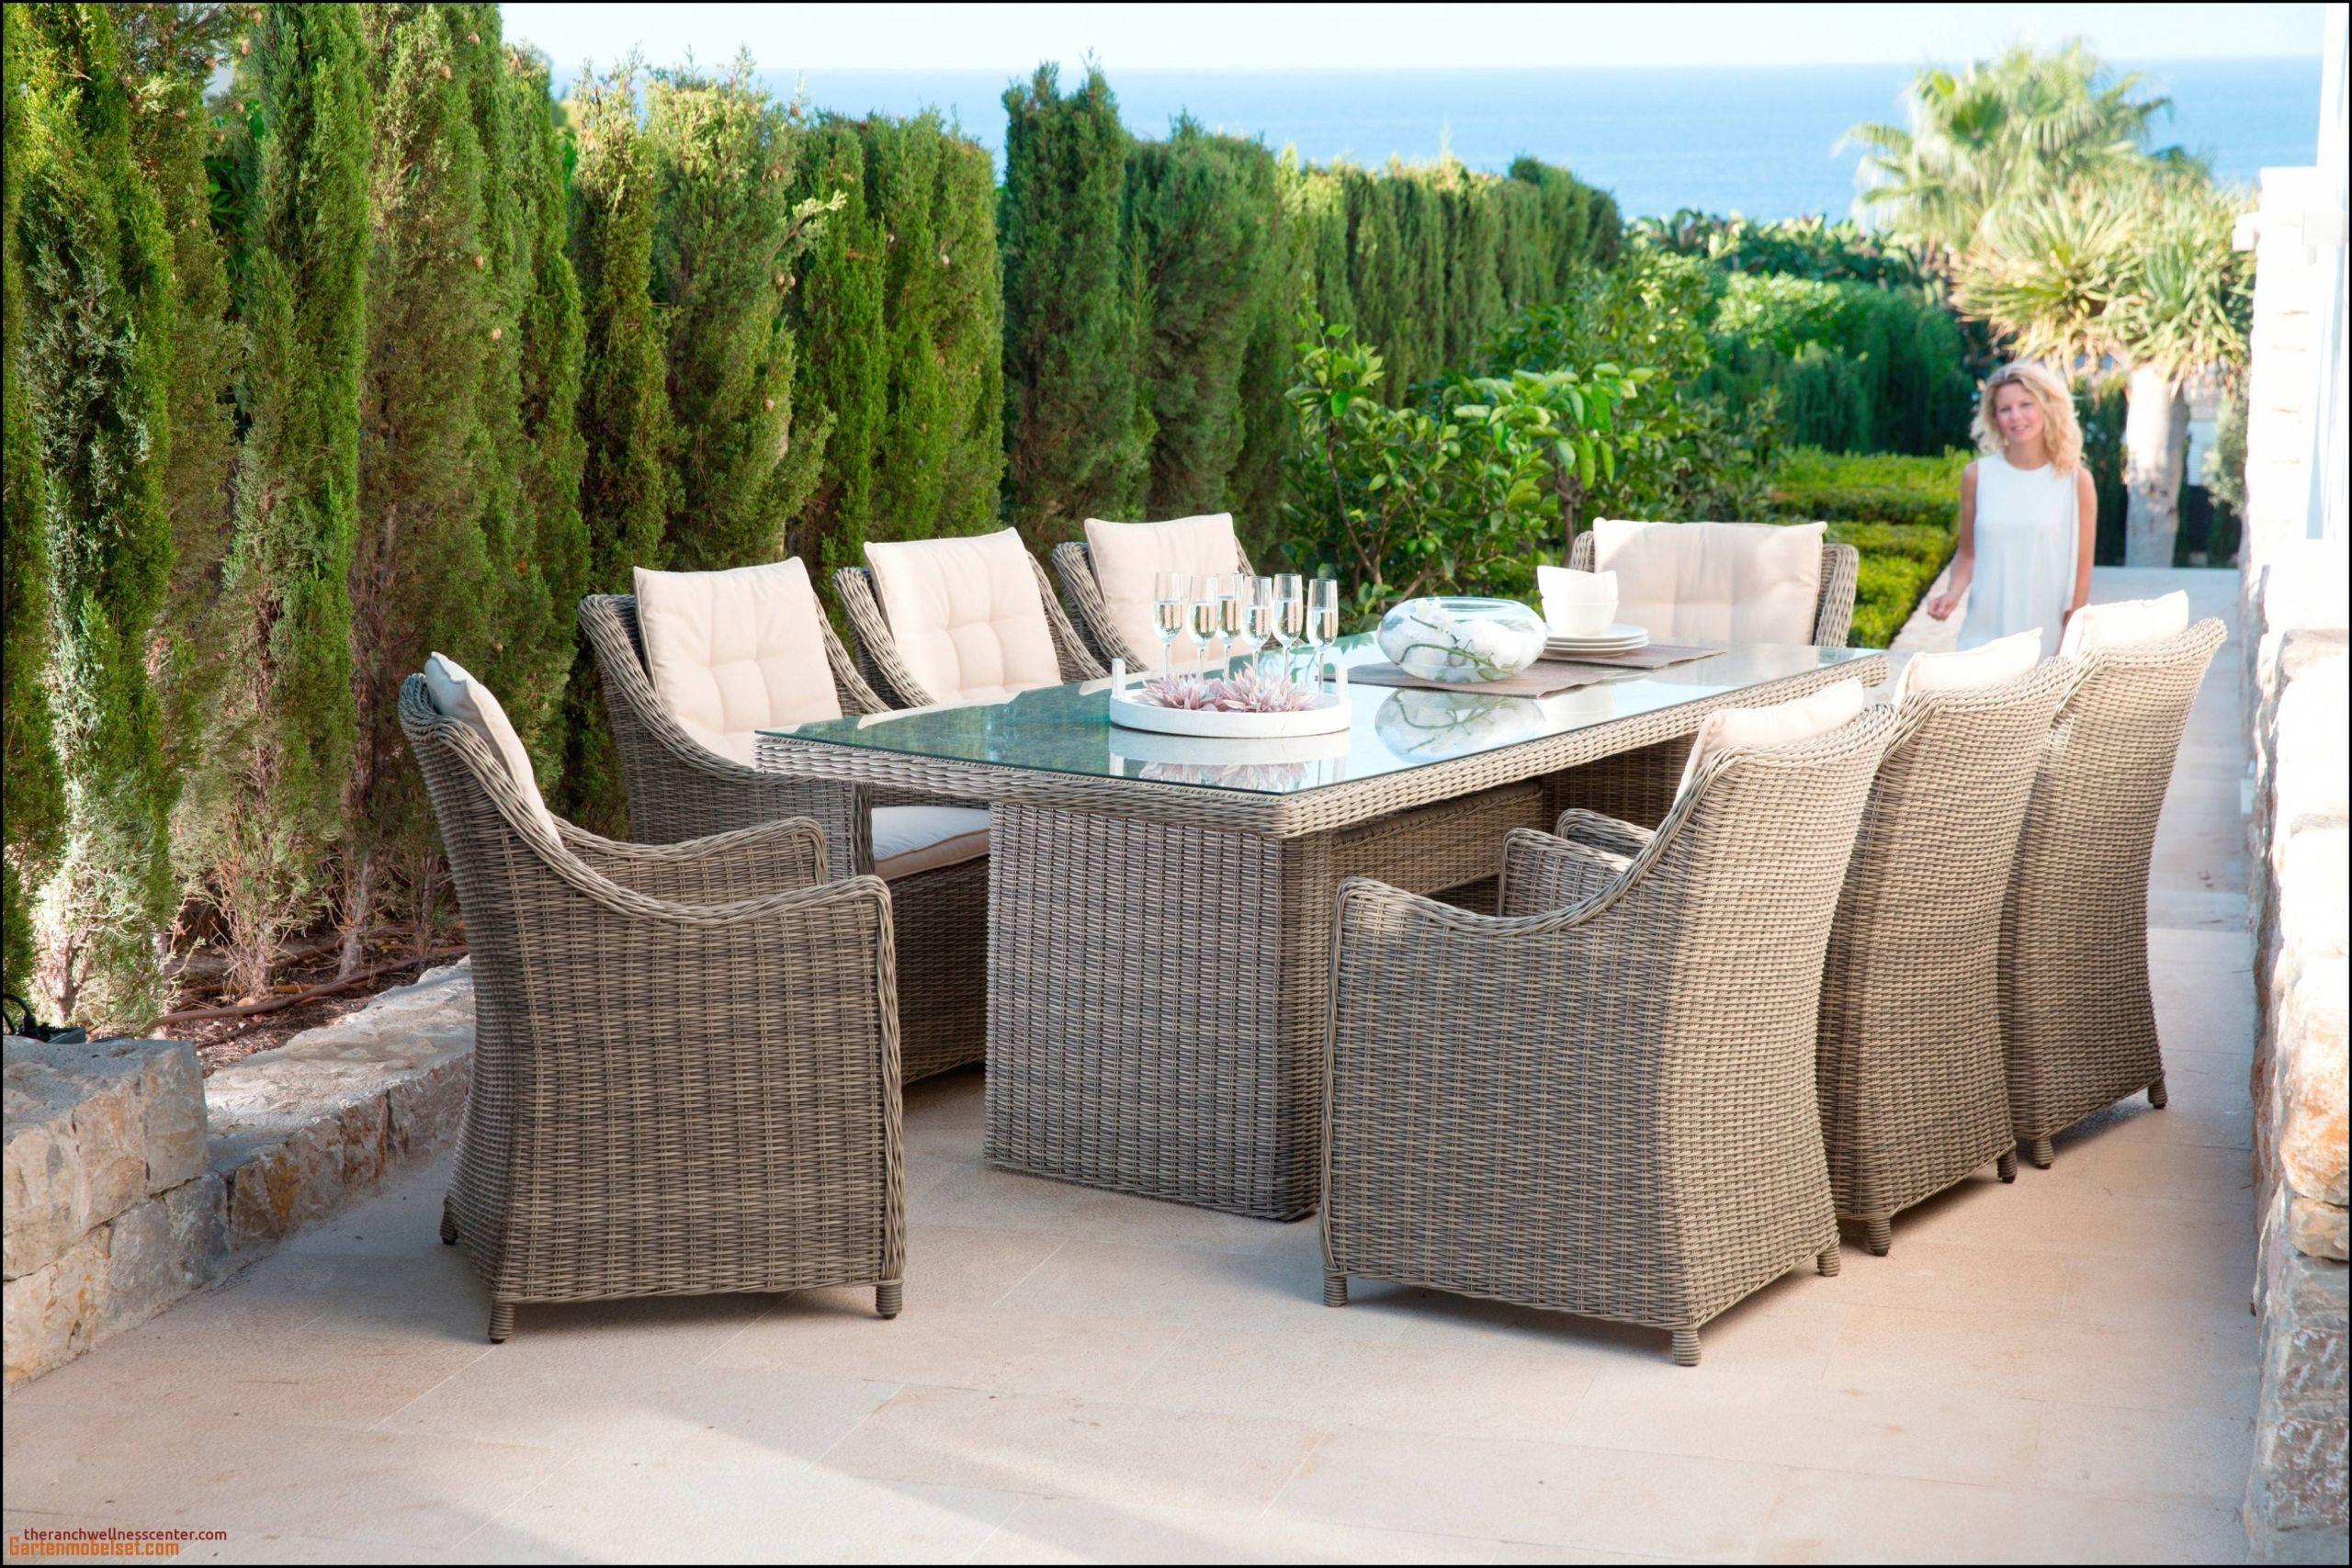 gartentisch gunstig garten loungemobel holz vianova project of gartentisch gunstig